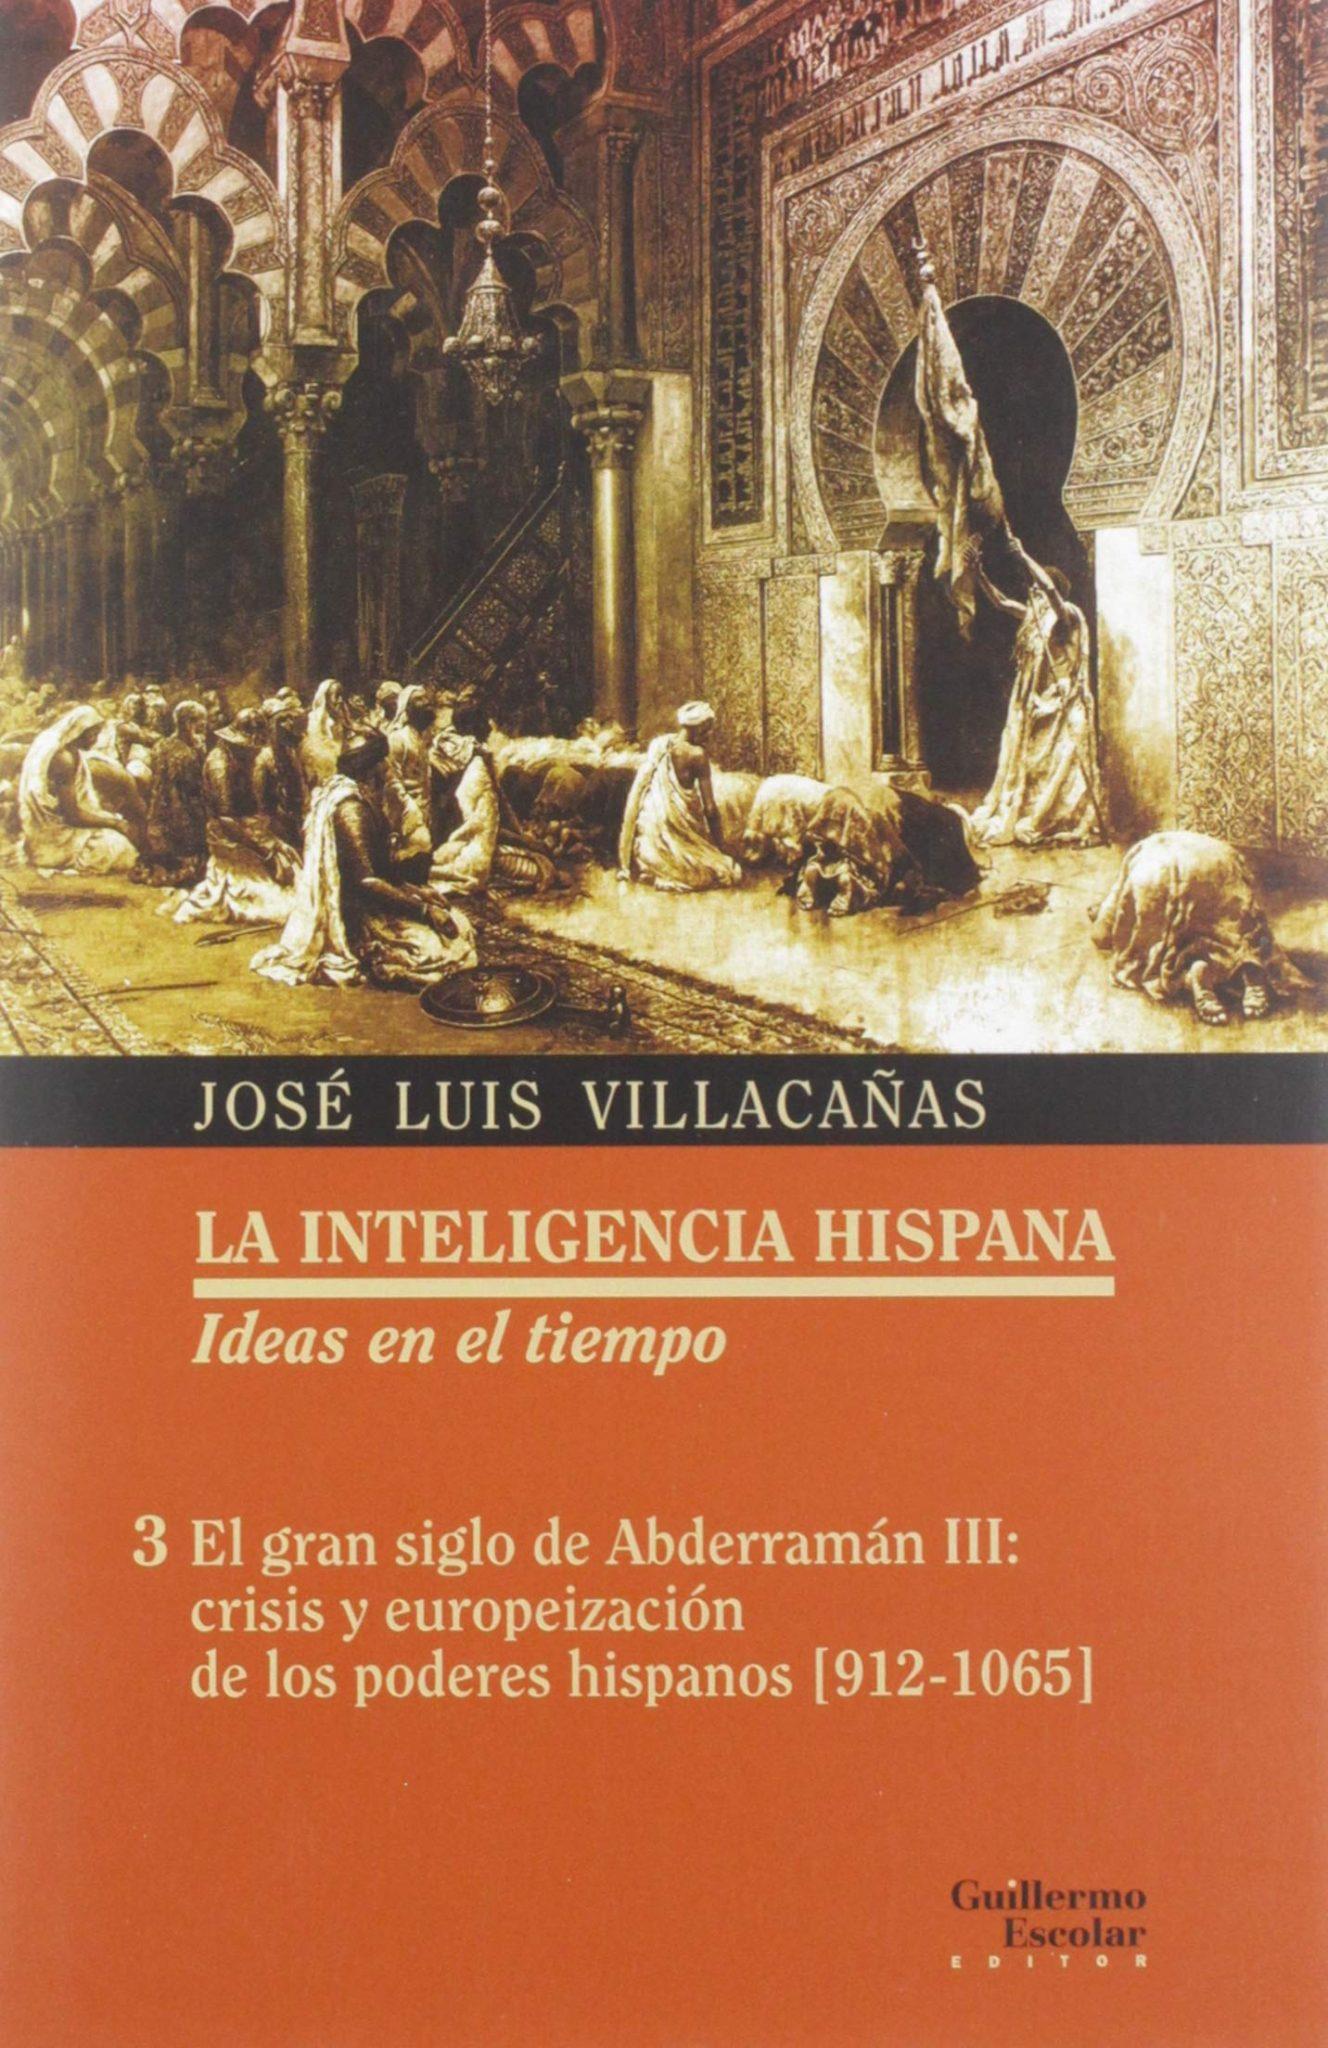 El gran siglo de Abderramán III: crisis y europeización de los poderes hispanos (912-1065) Book Cover